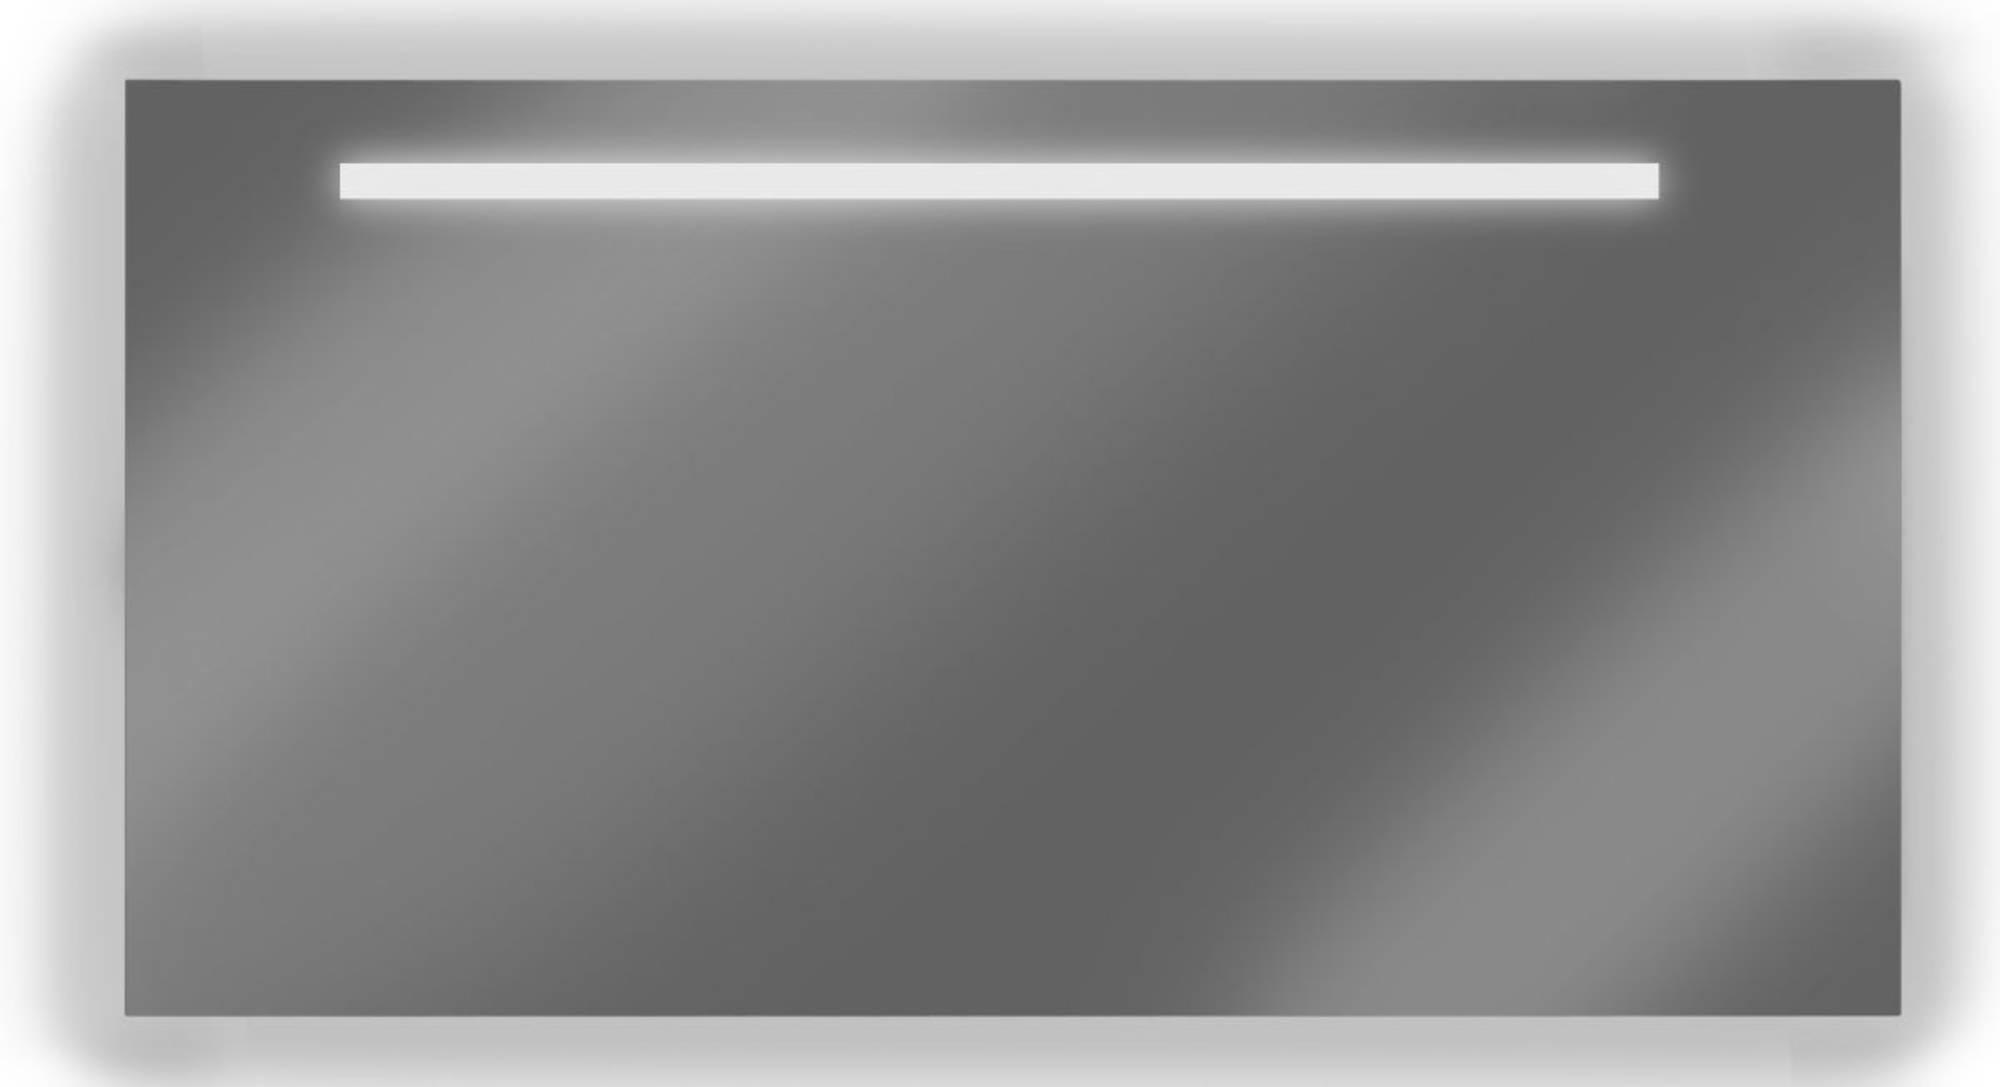 Looox X-line spiegel 120x70 cm. met led - verwarming - sensor